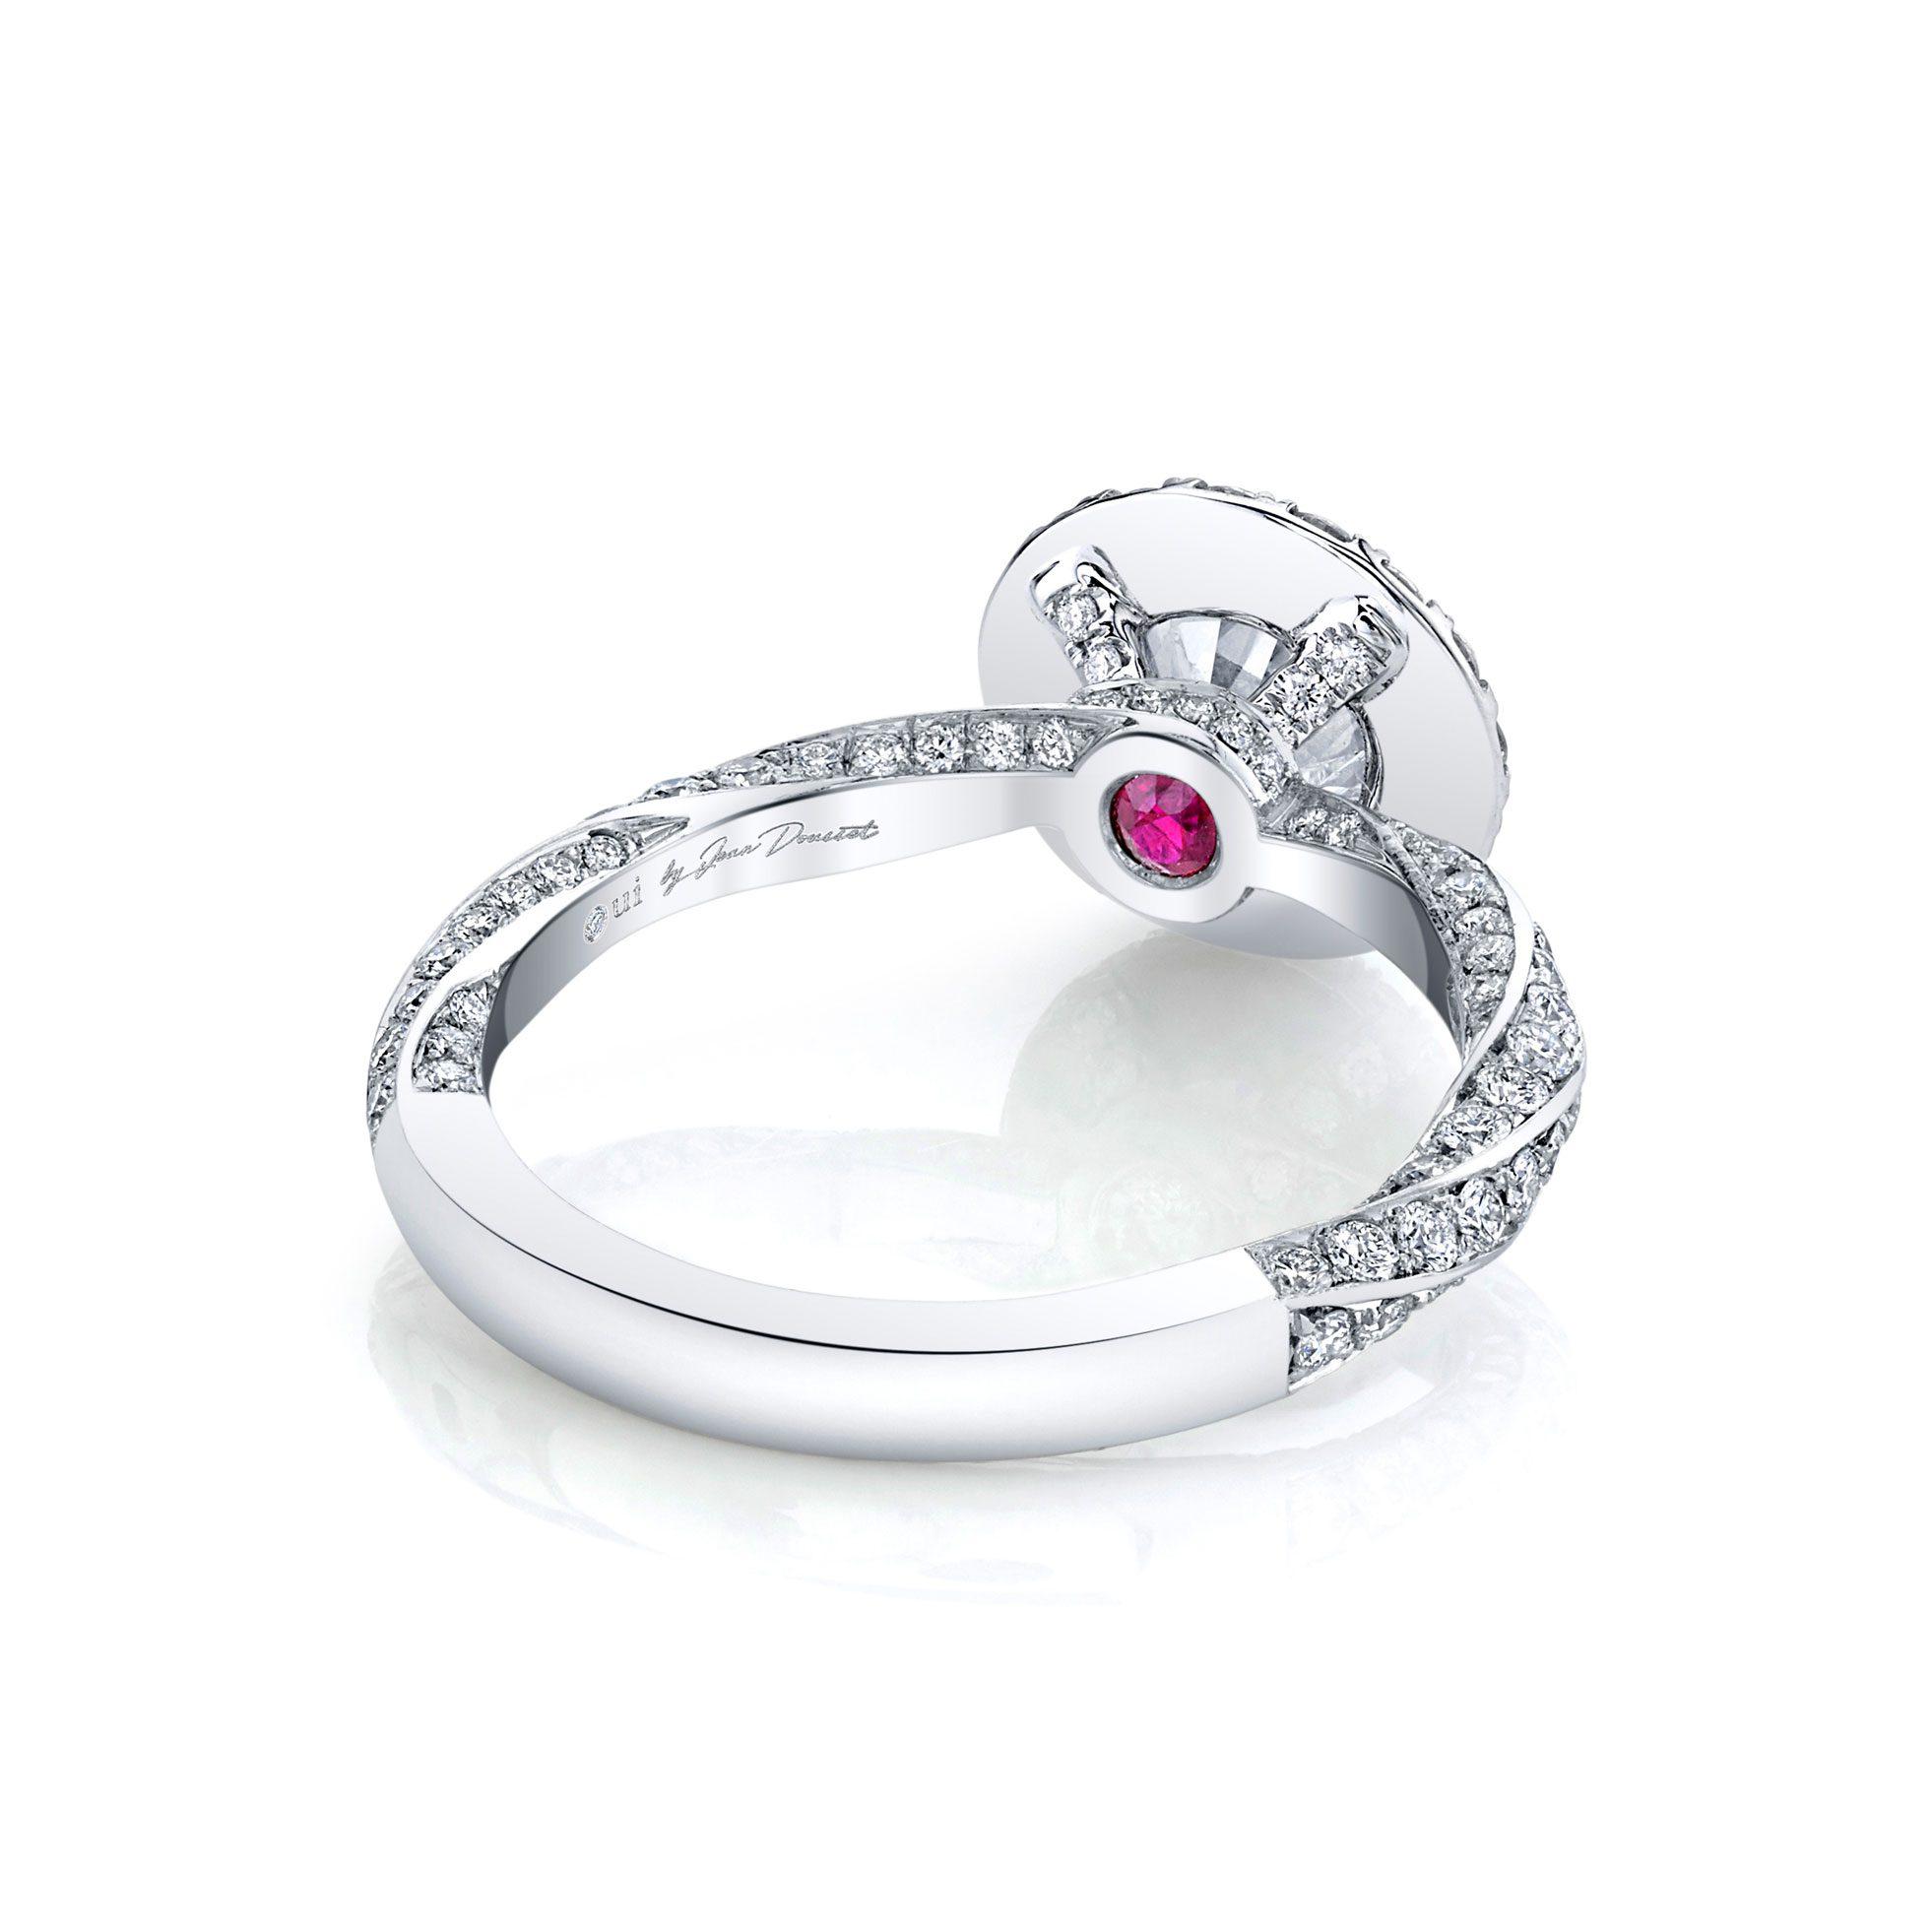 Camille Seamless Halo® Round Brilliant Engagement Ring 18k White Gold Back Shot